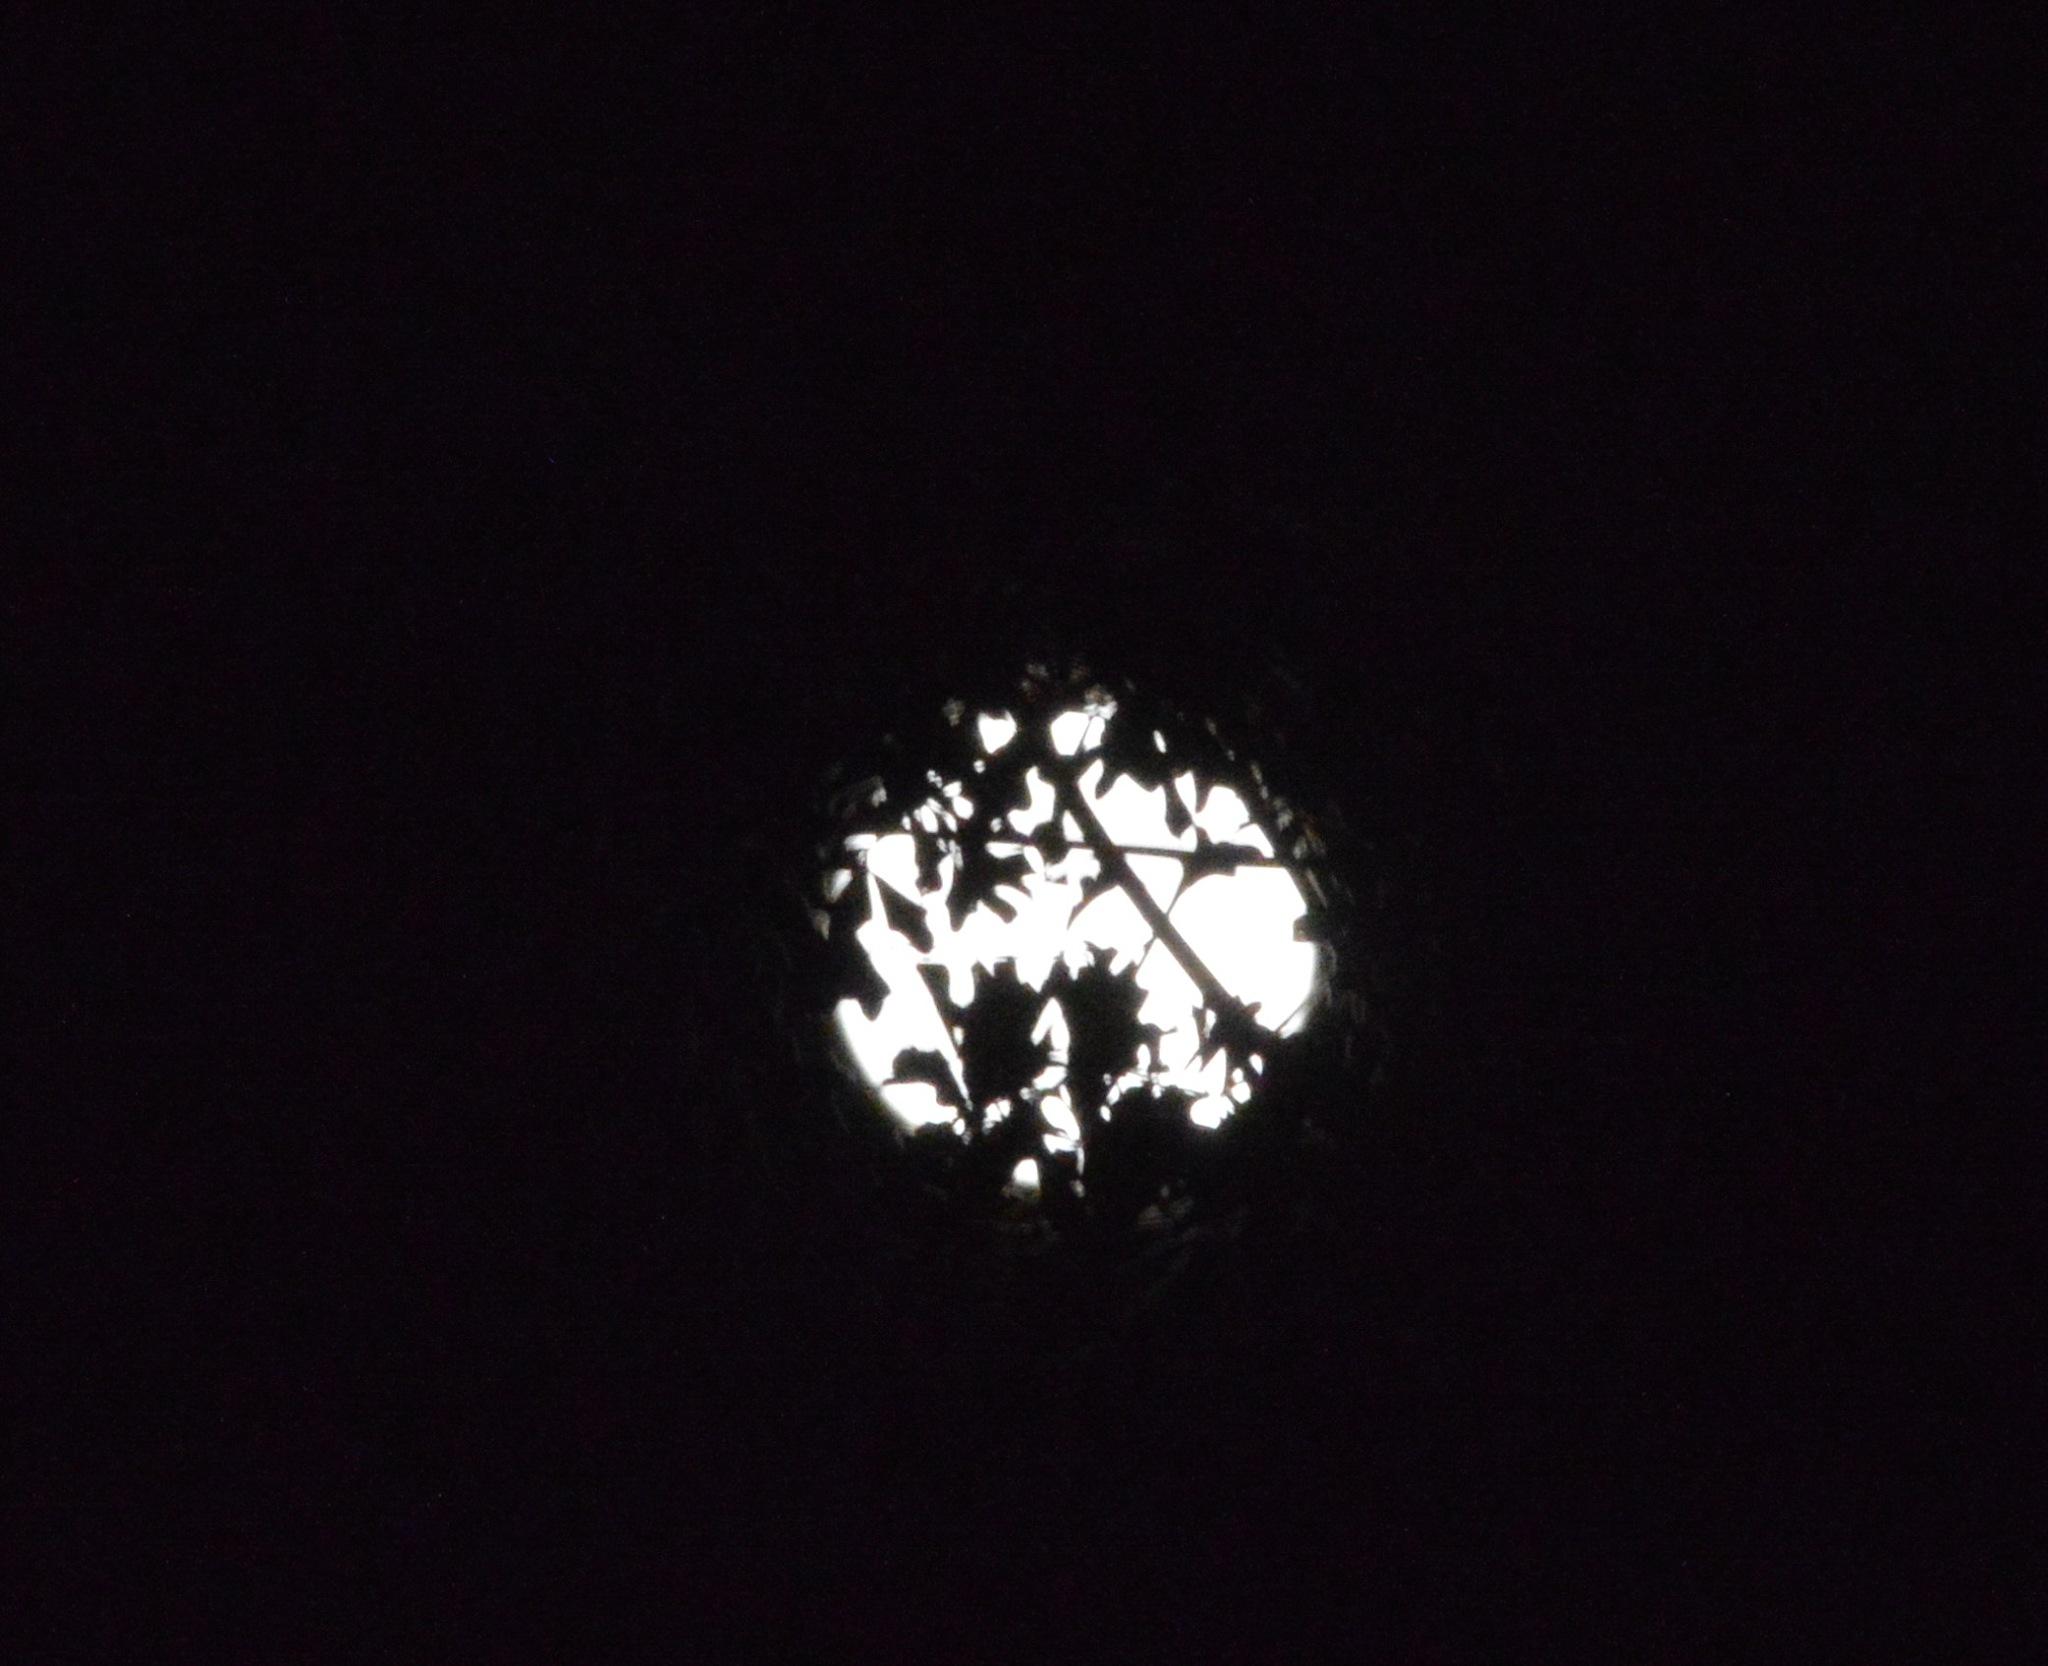 hidden moon by rednecksummers